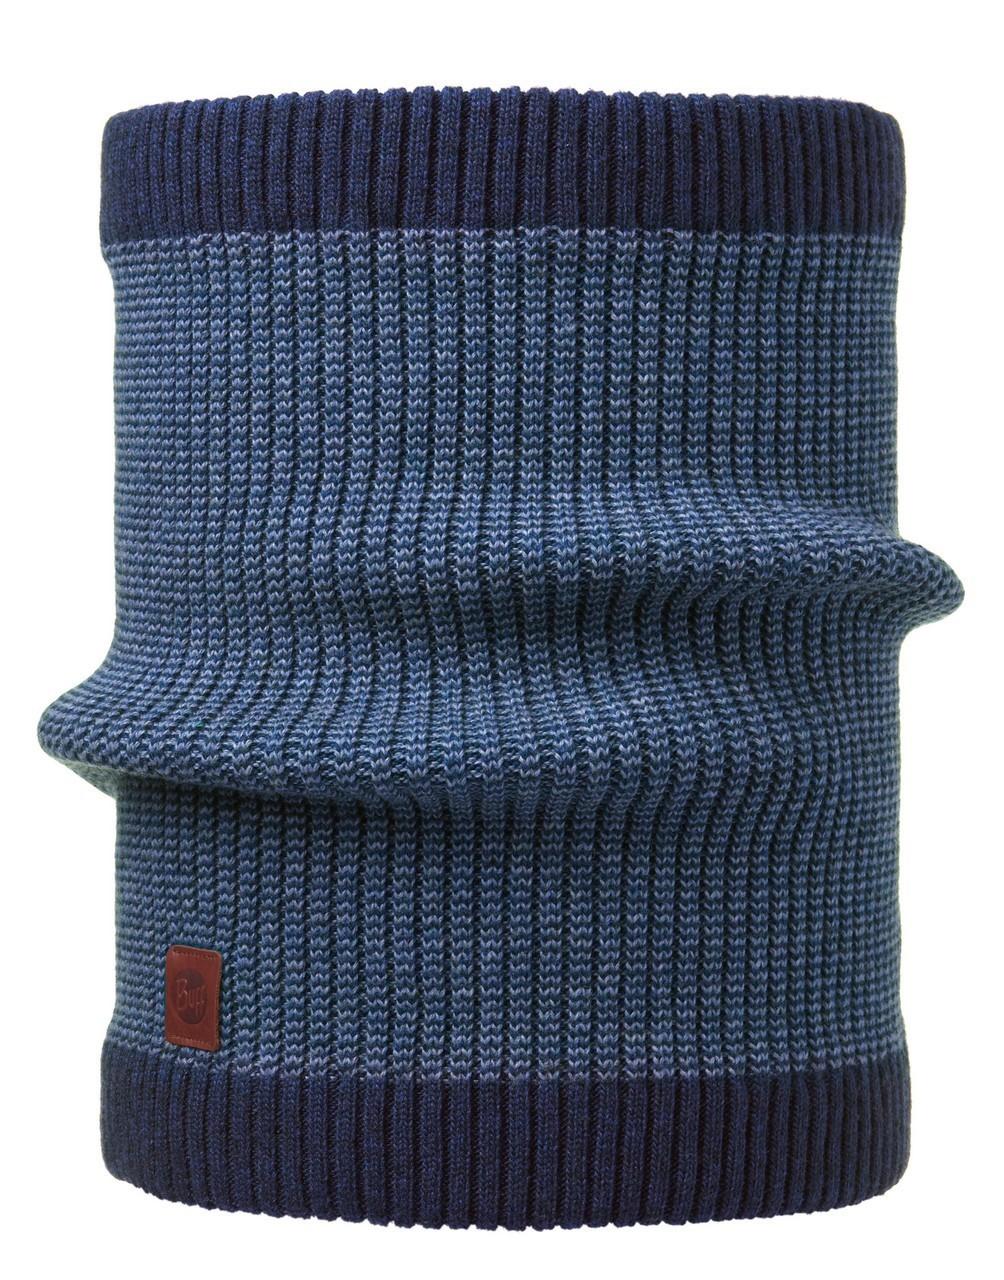 Вязаные шарфы Вязаный шарф-труба Buff Comfort Dee Blue 116047.707.10.00.jpg